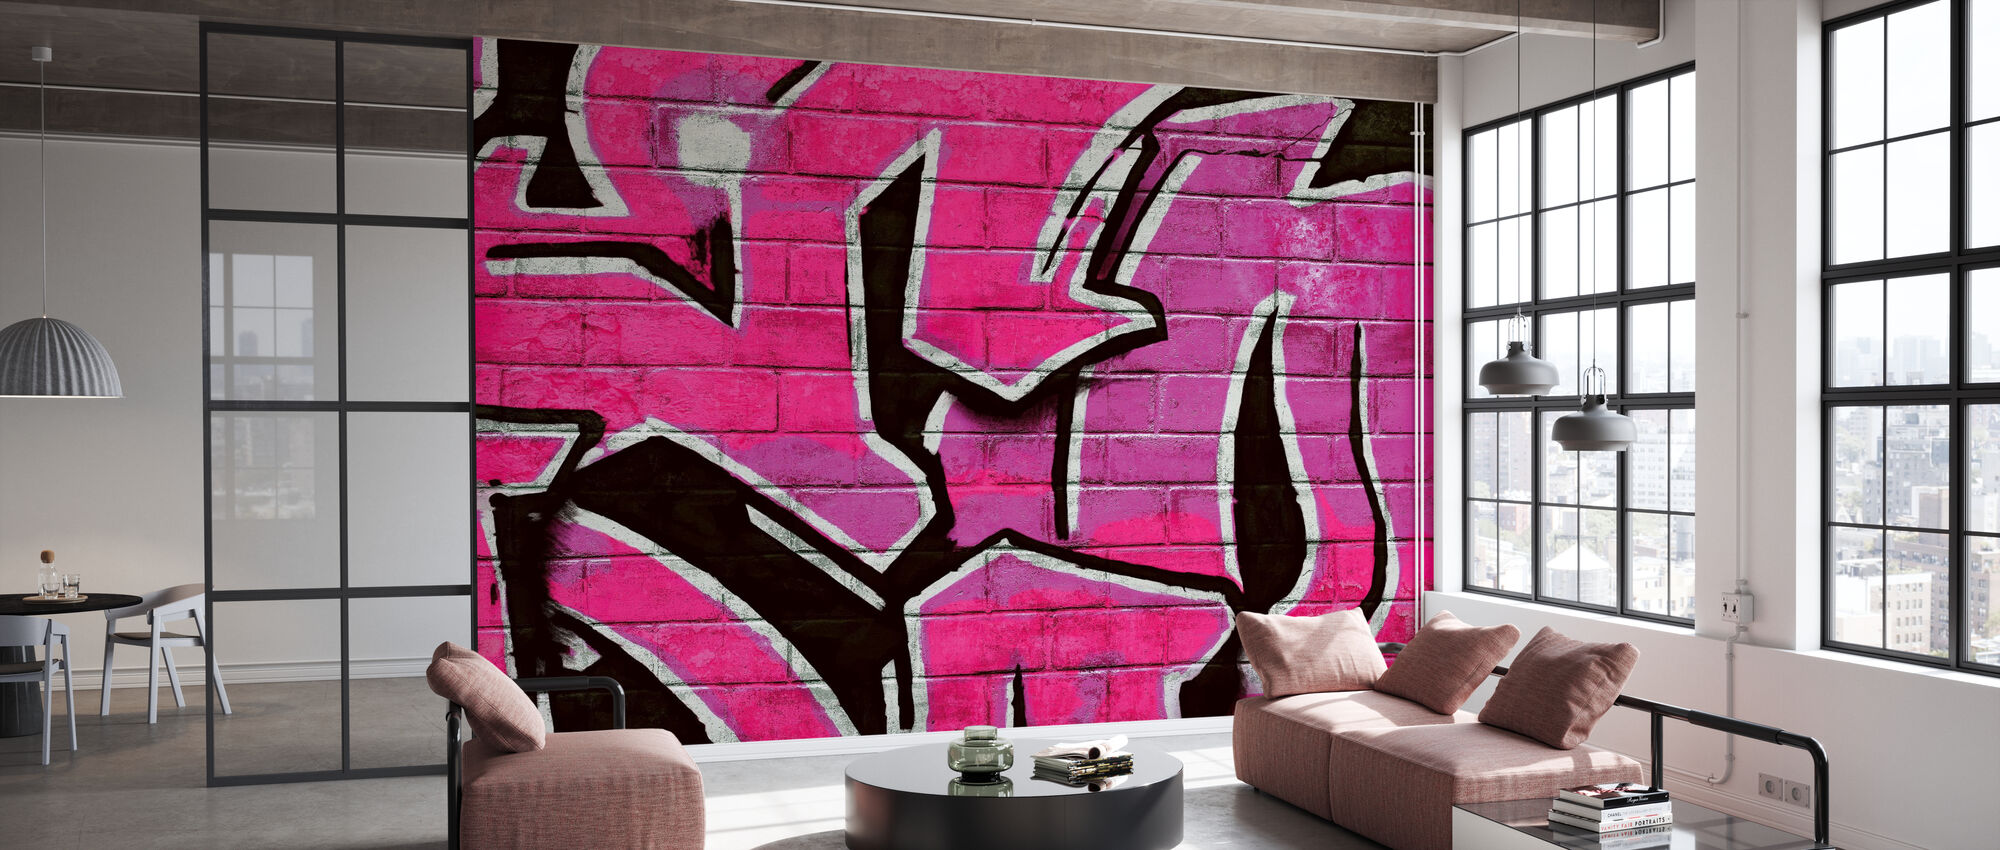 Graffiti Brick Wall - Pink - Wallpaper - Office